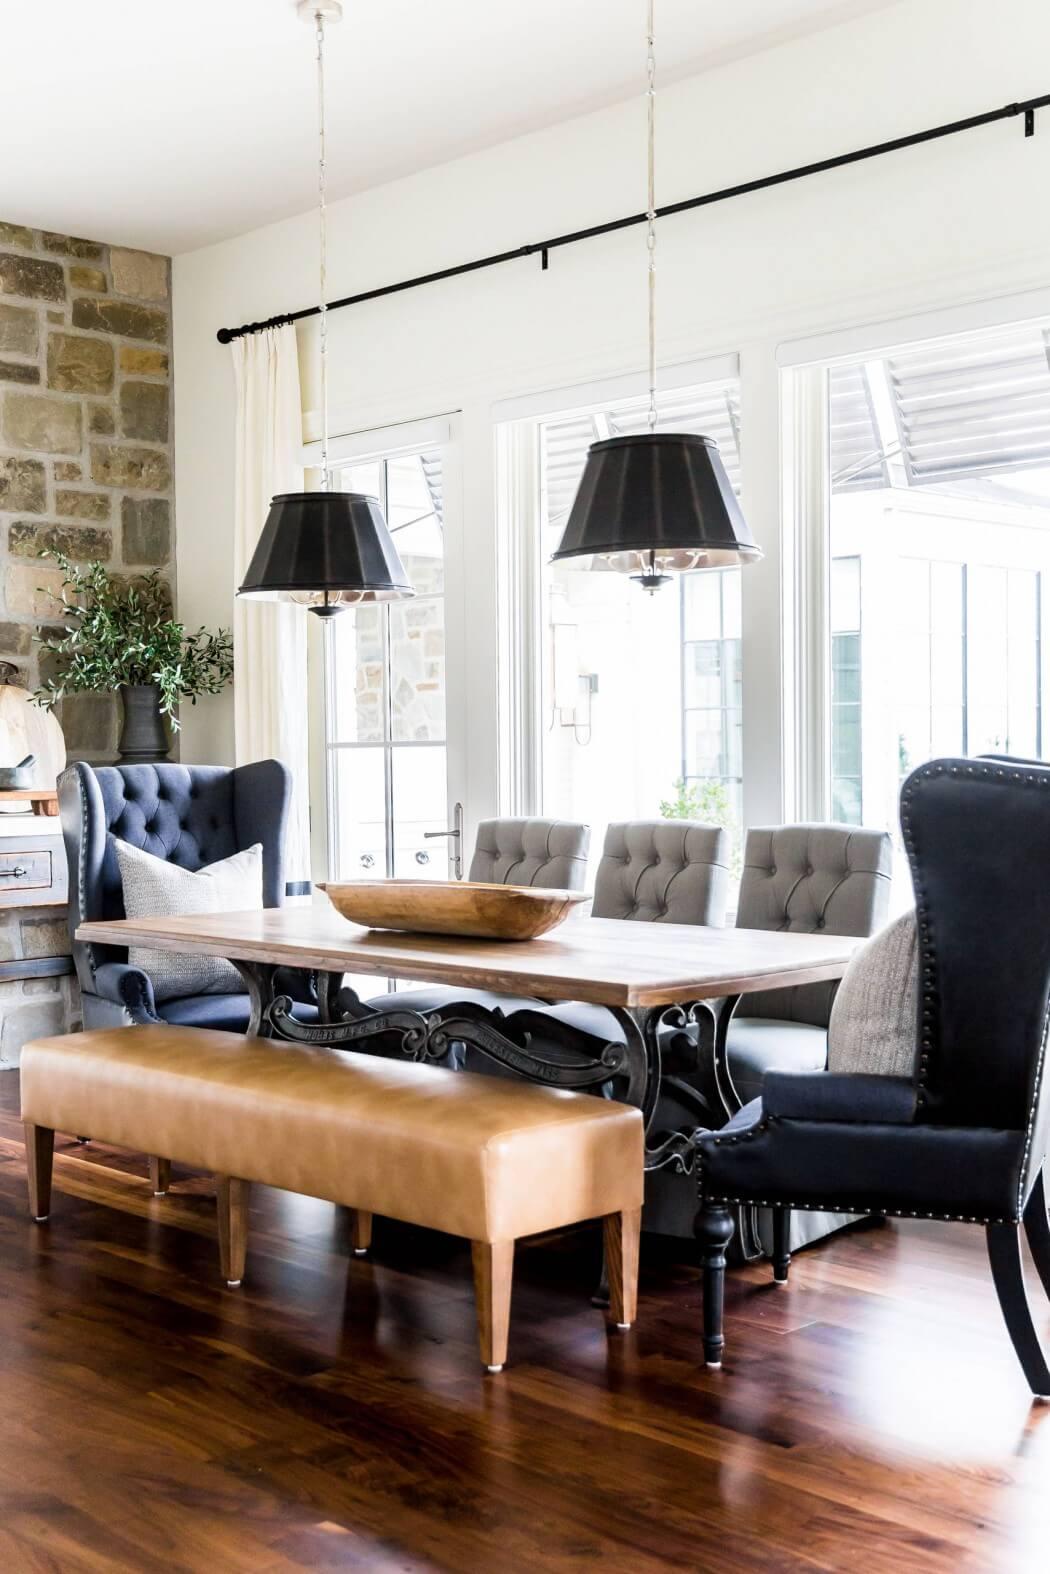 dreamy-cozy-home-hawkins5